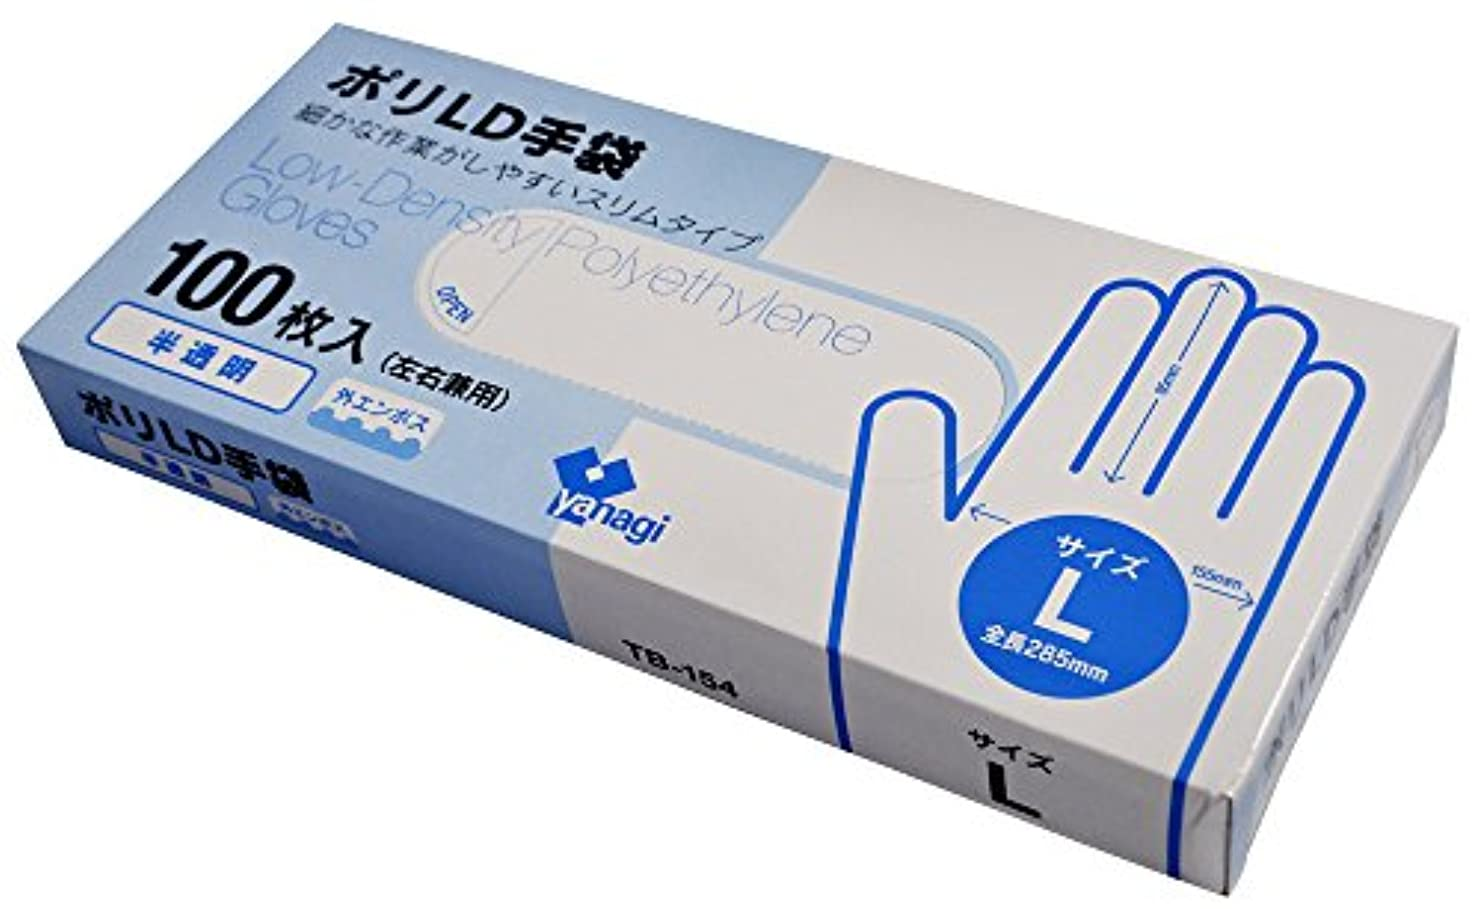 不運植物学者悲劇的な使い捨て ポリLD手袋 半透明 左右兼用 Lサイズ 100枚入 食品衛生法規格基準適合品 TB-154